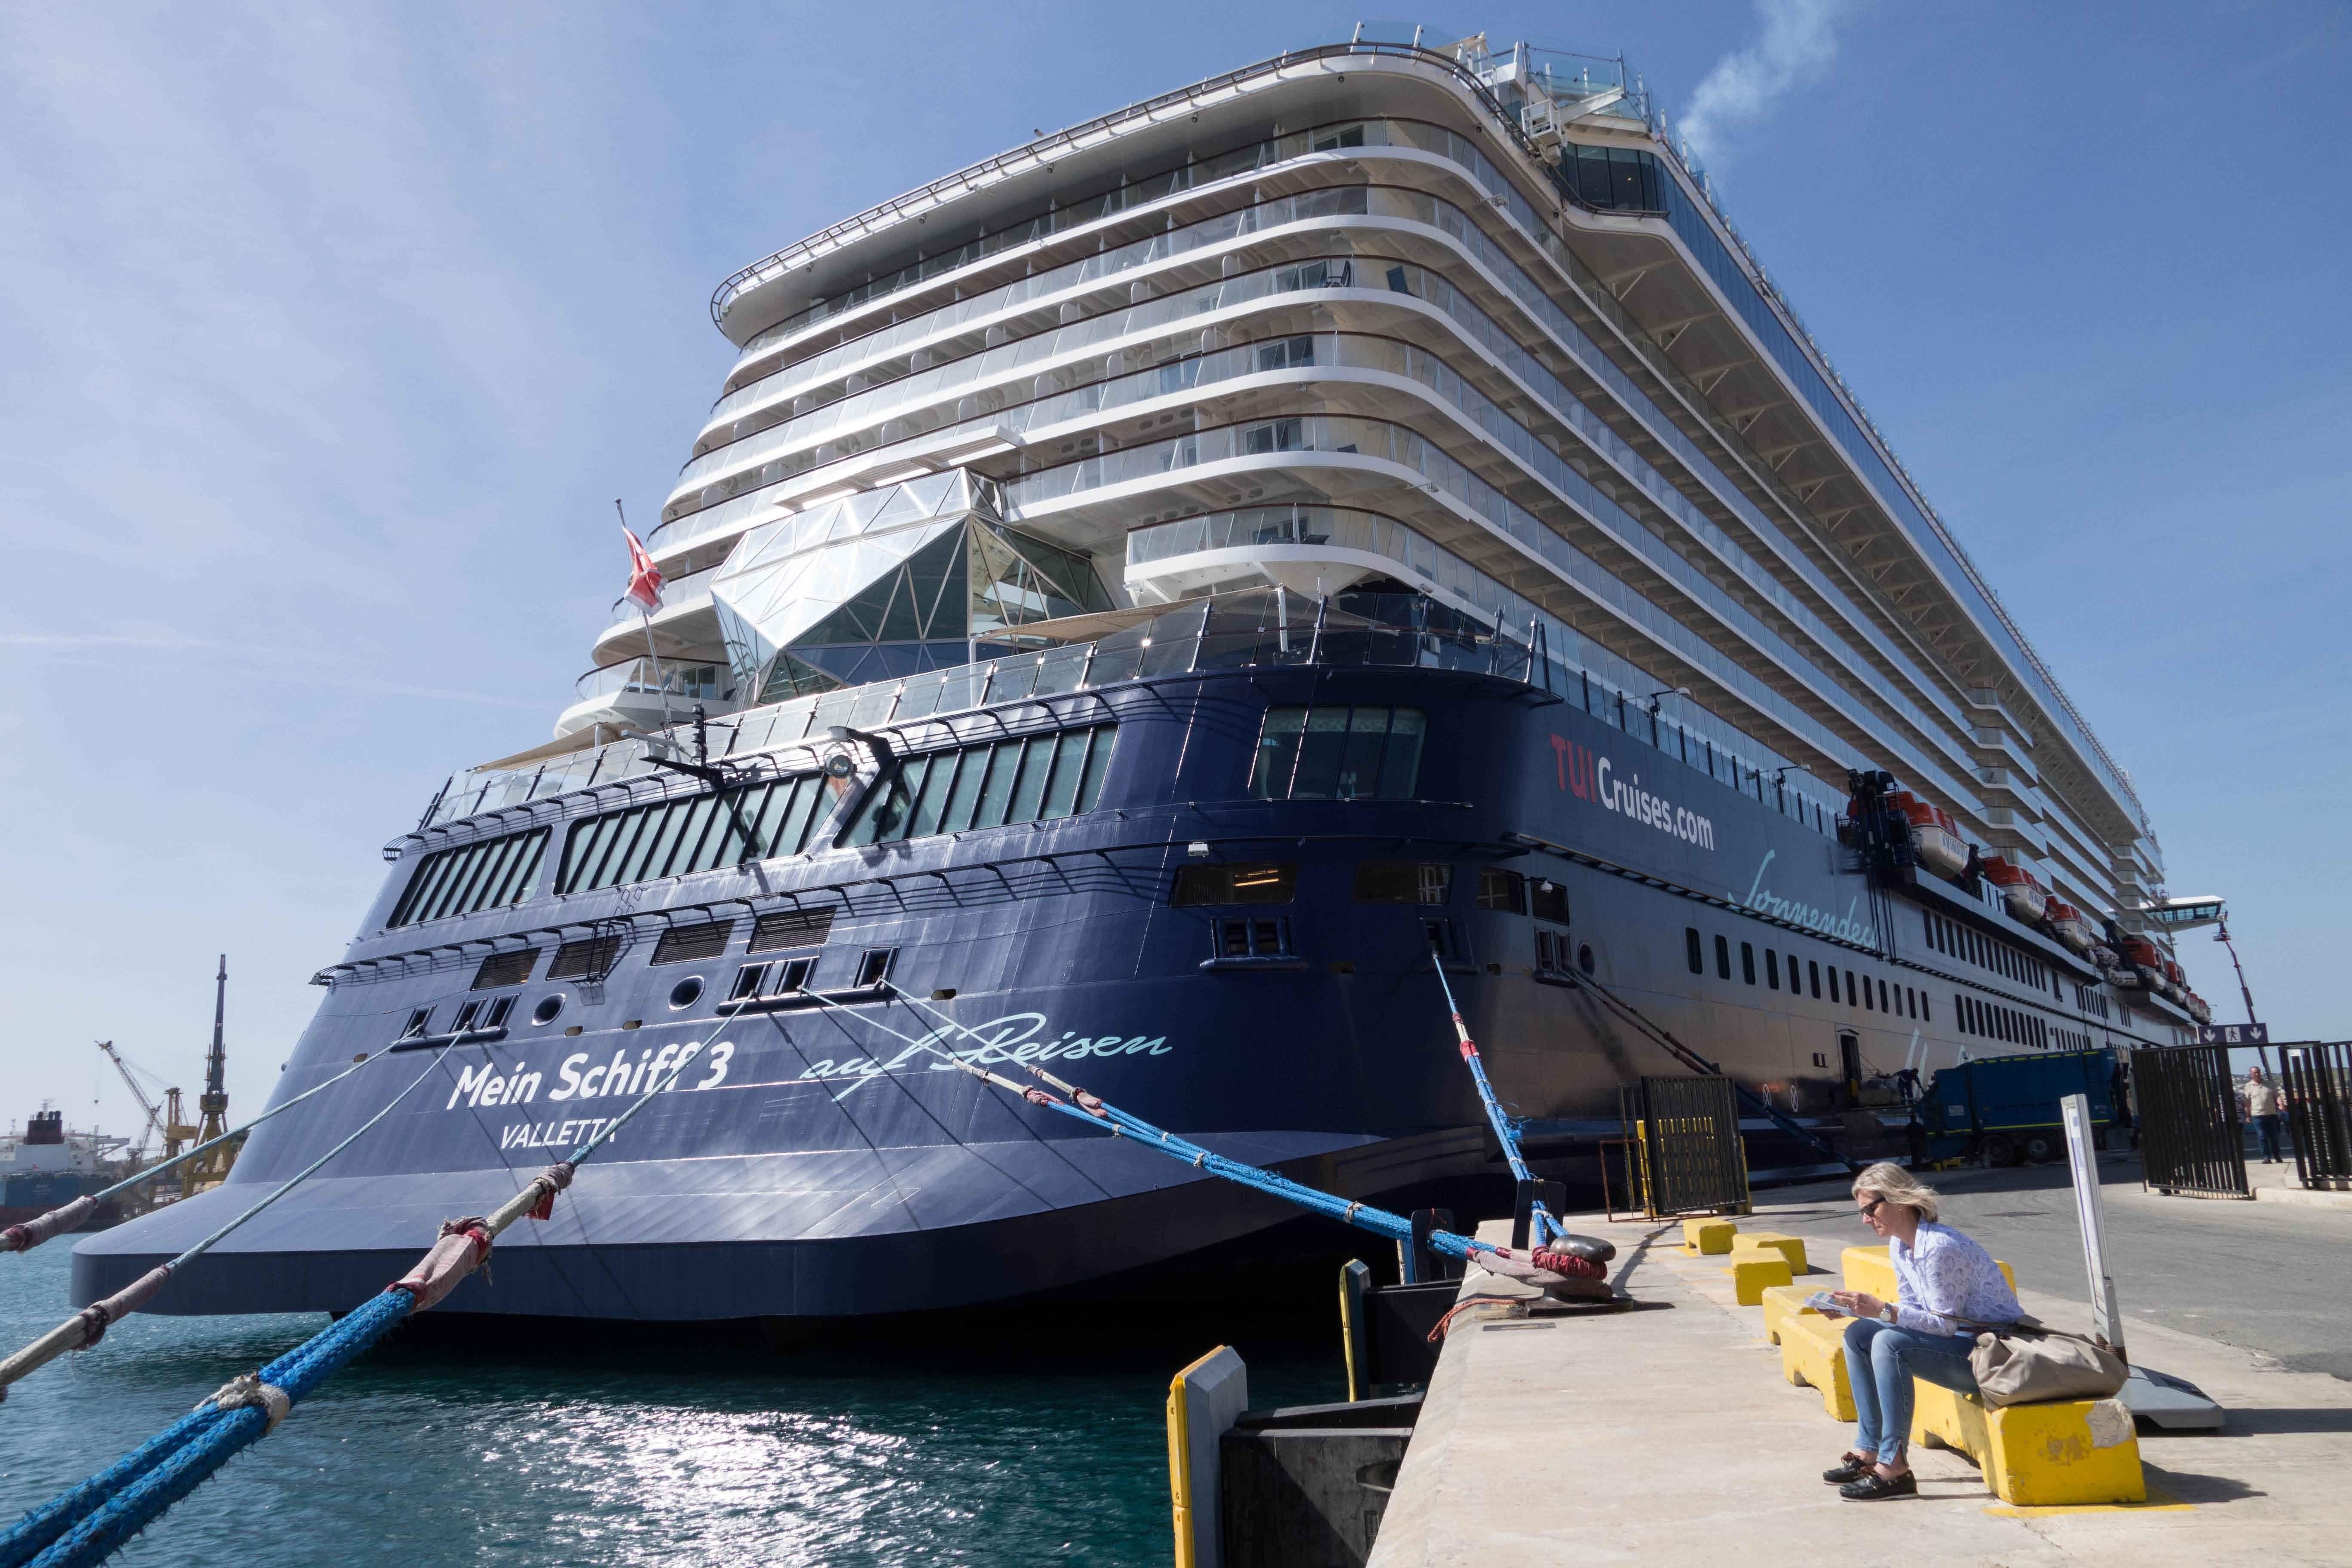 Blue And White Main Schiff 3 Cruise Ship Free Image Peakpx Holiday ...